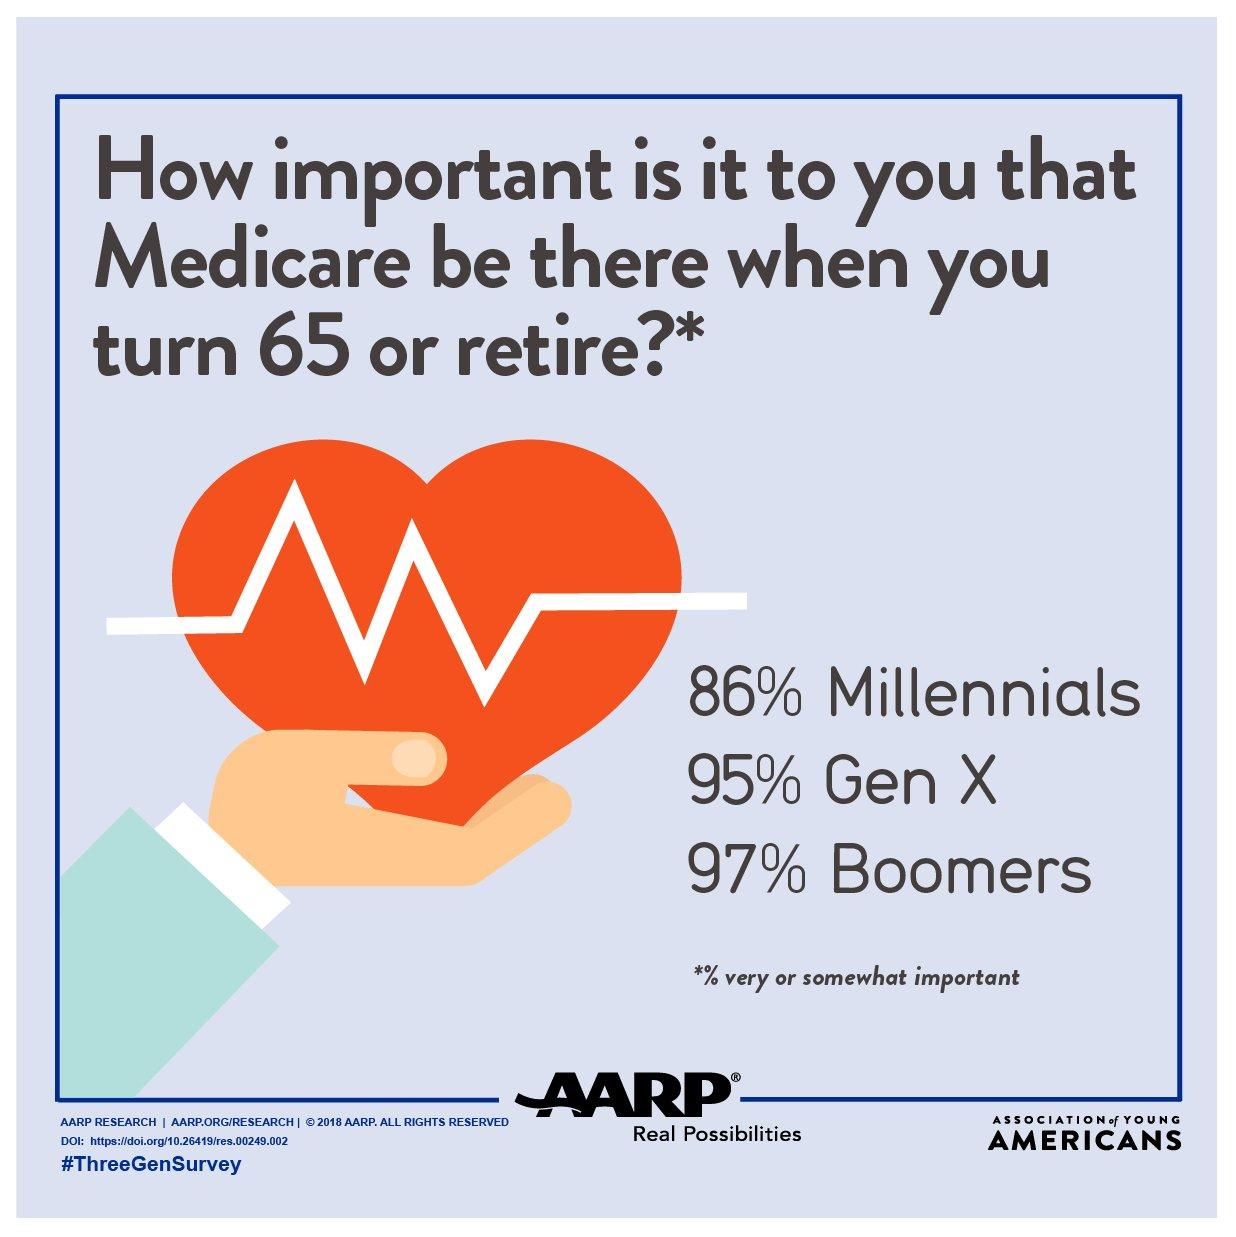 Three Generations Survey: Medicare Graphic